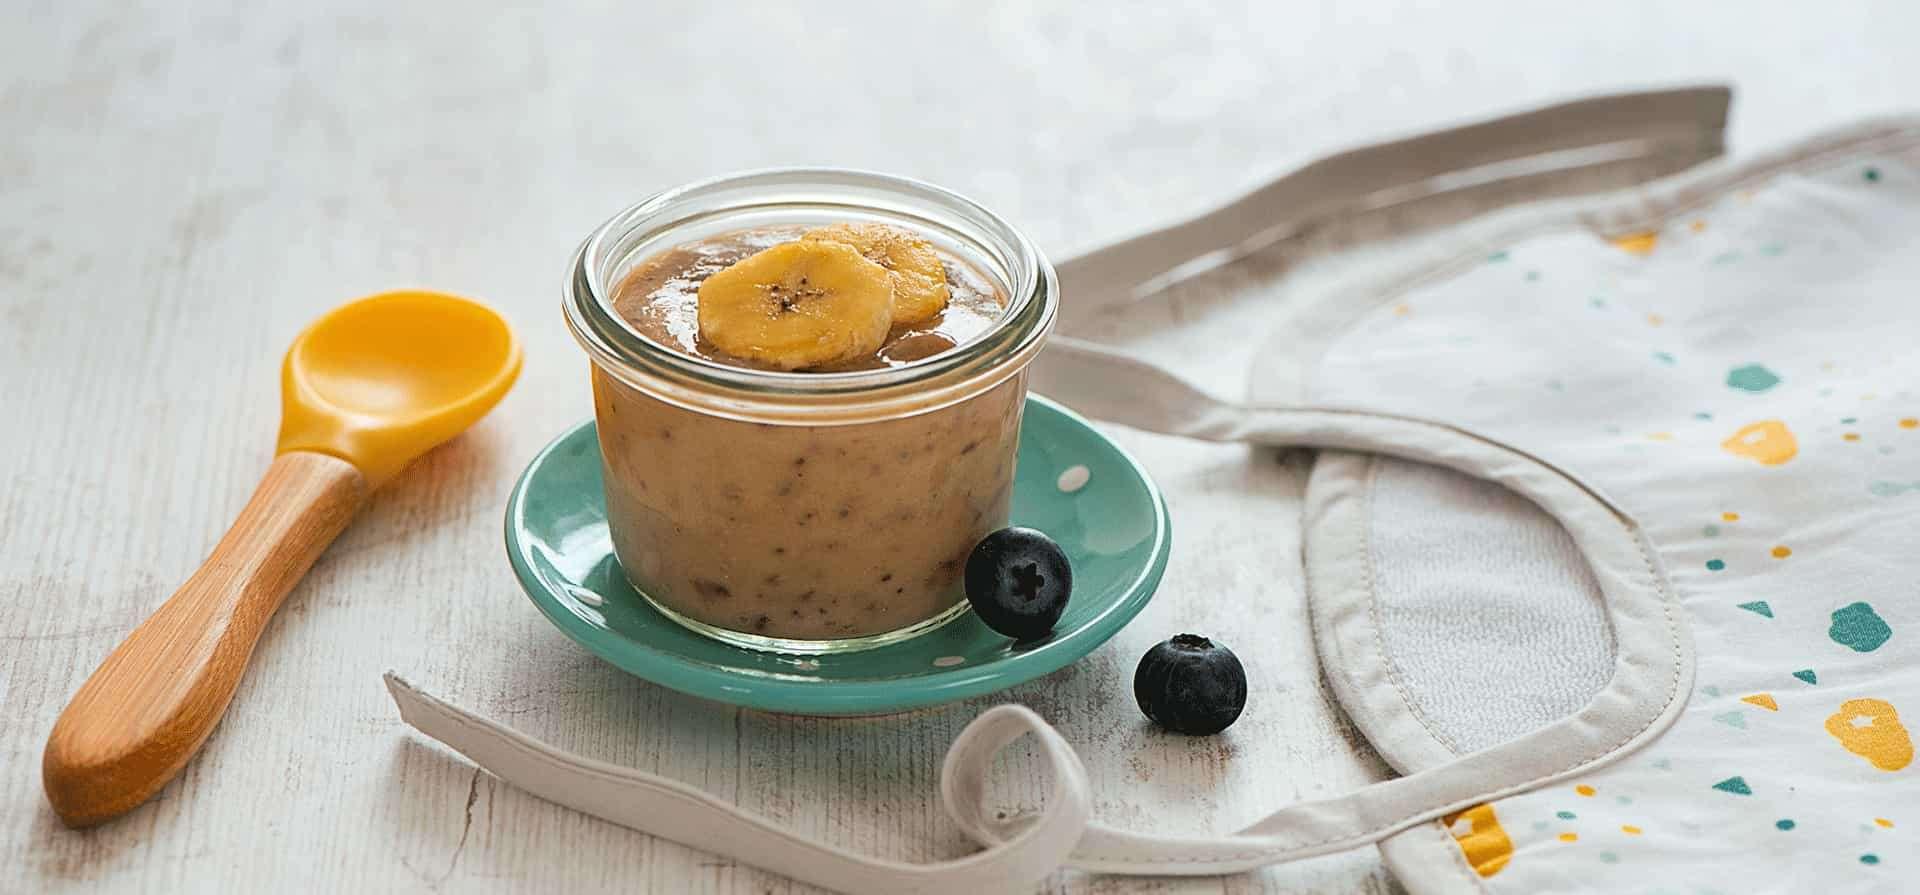 Recipe Banana and Blueberry Cream